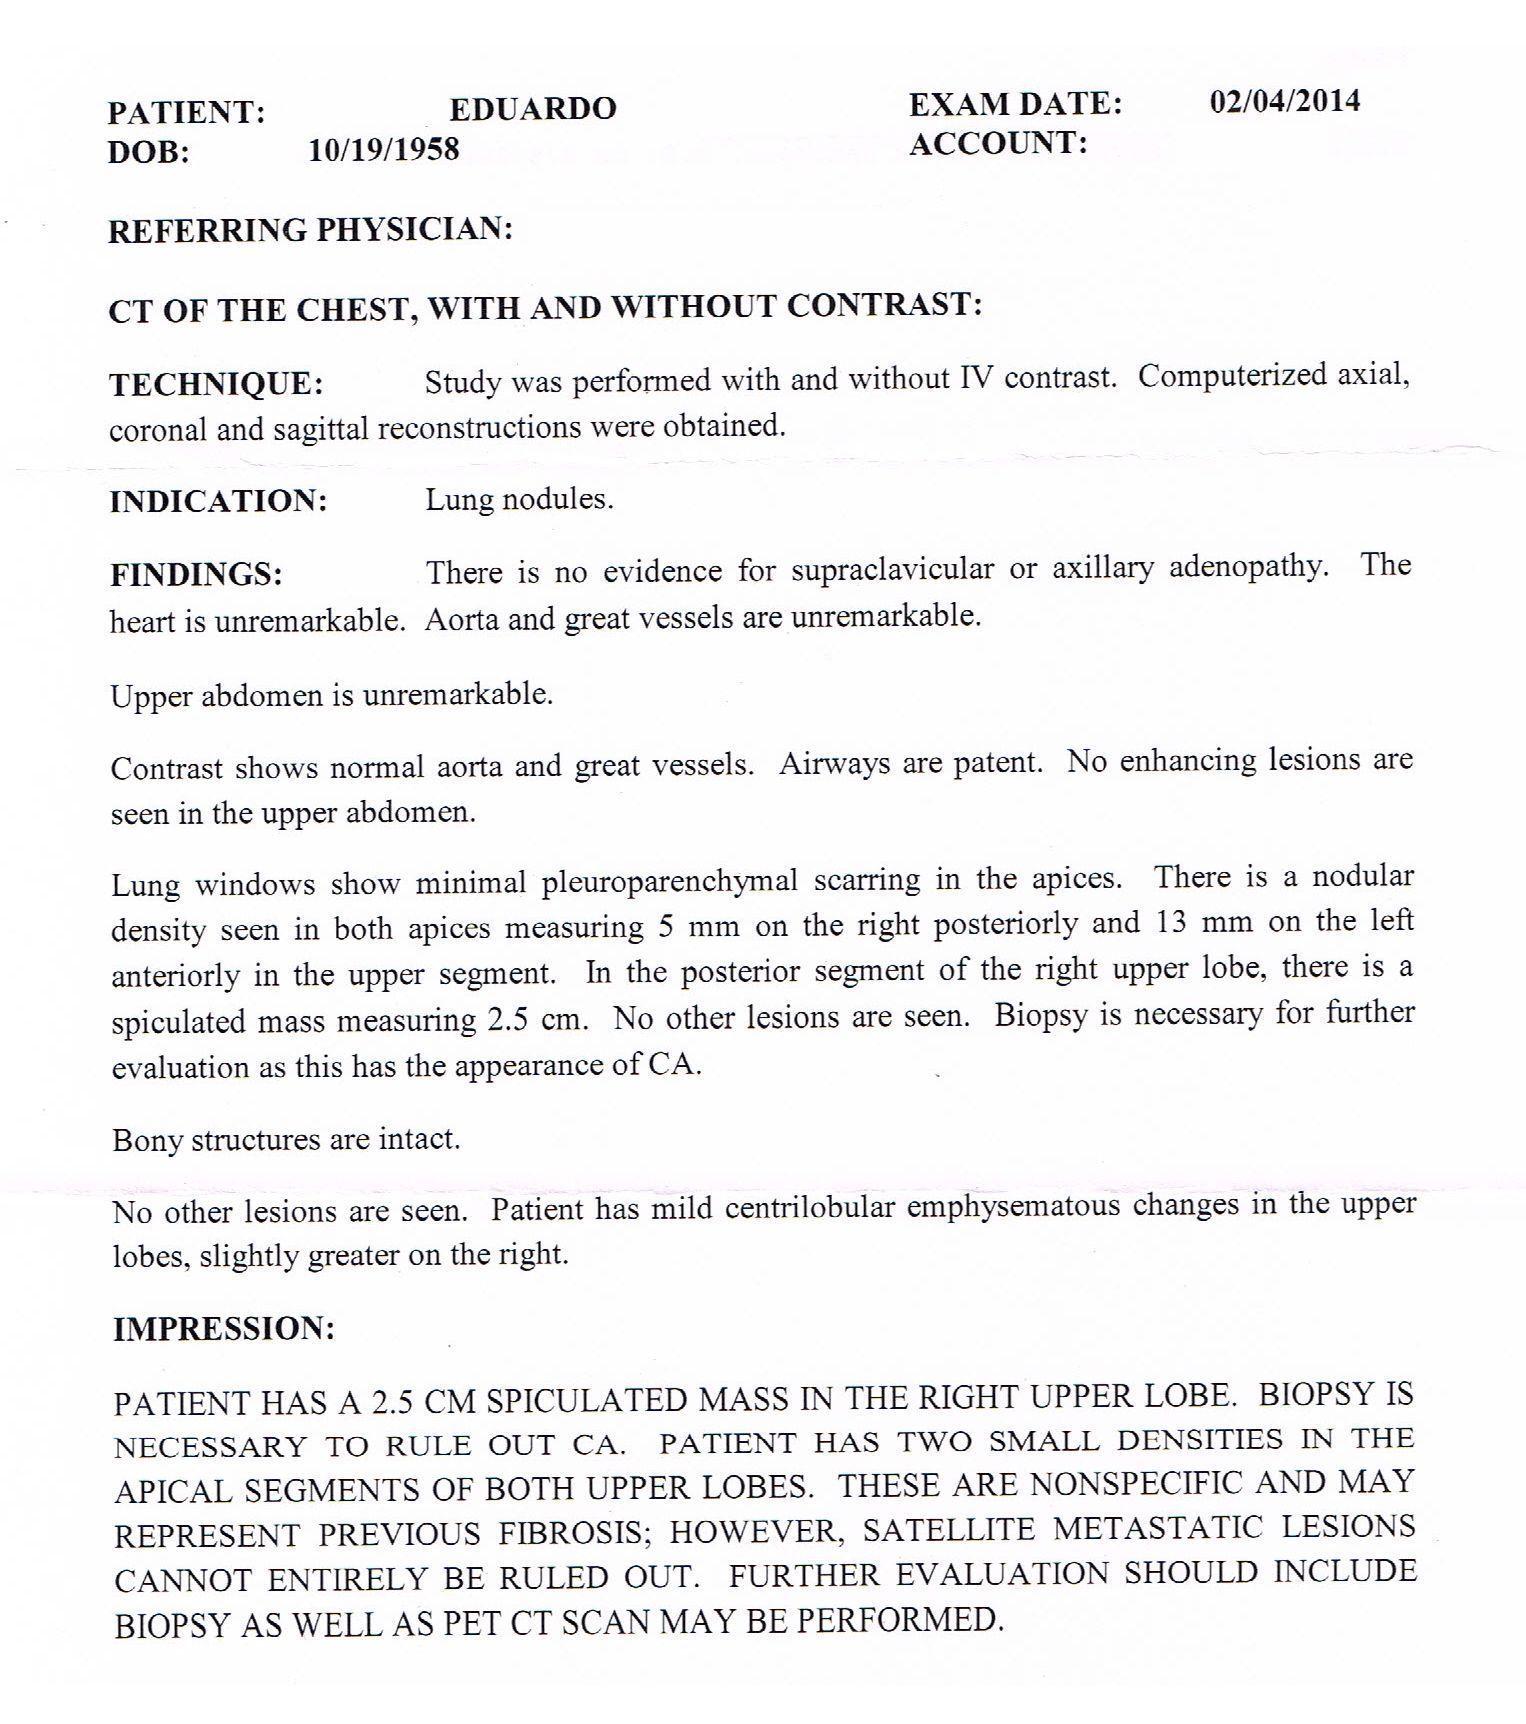 LifEscozul® - Eduardo - Cáncer de Pulmon 1